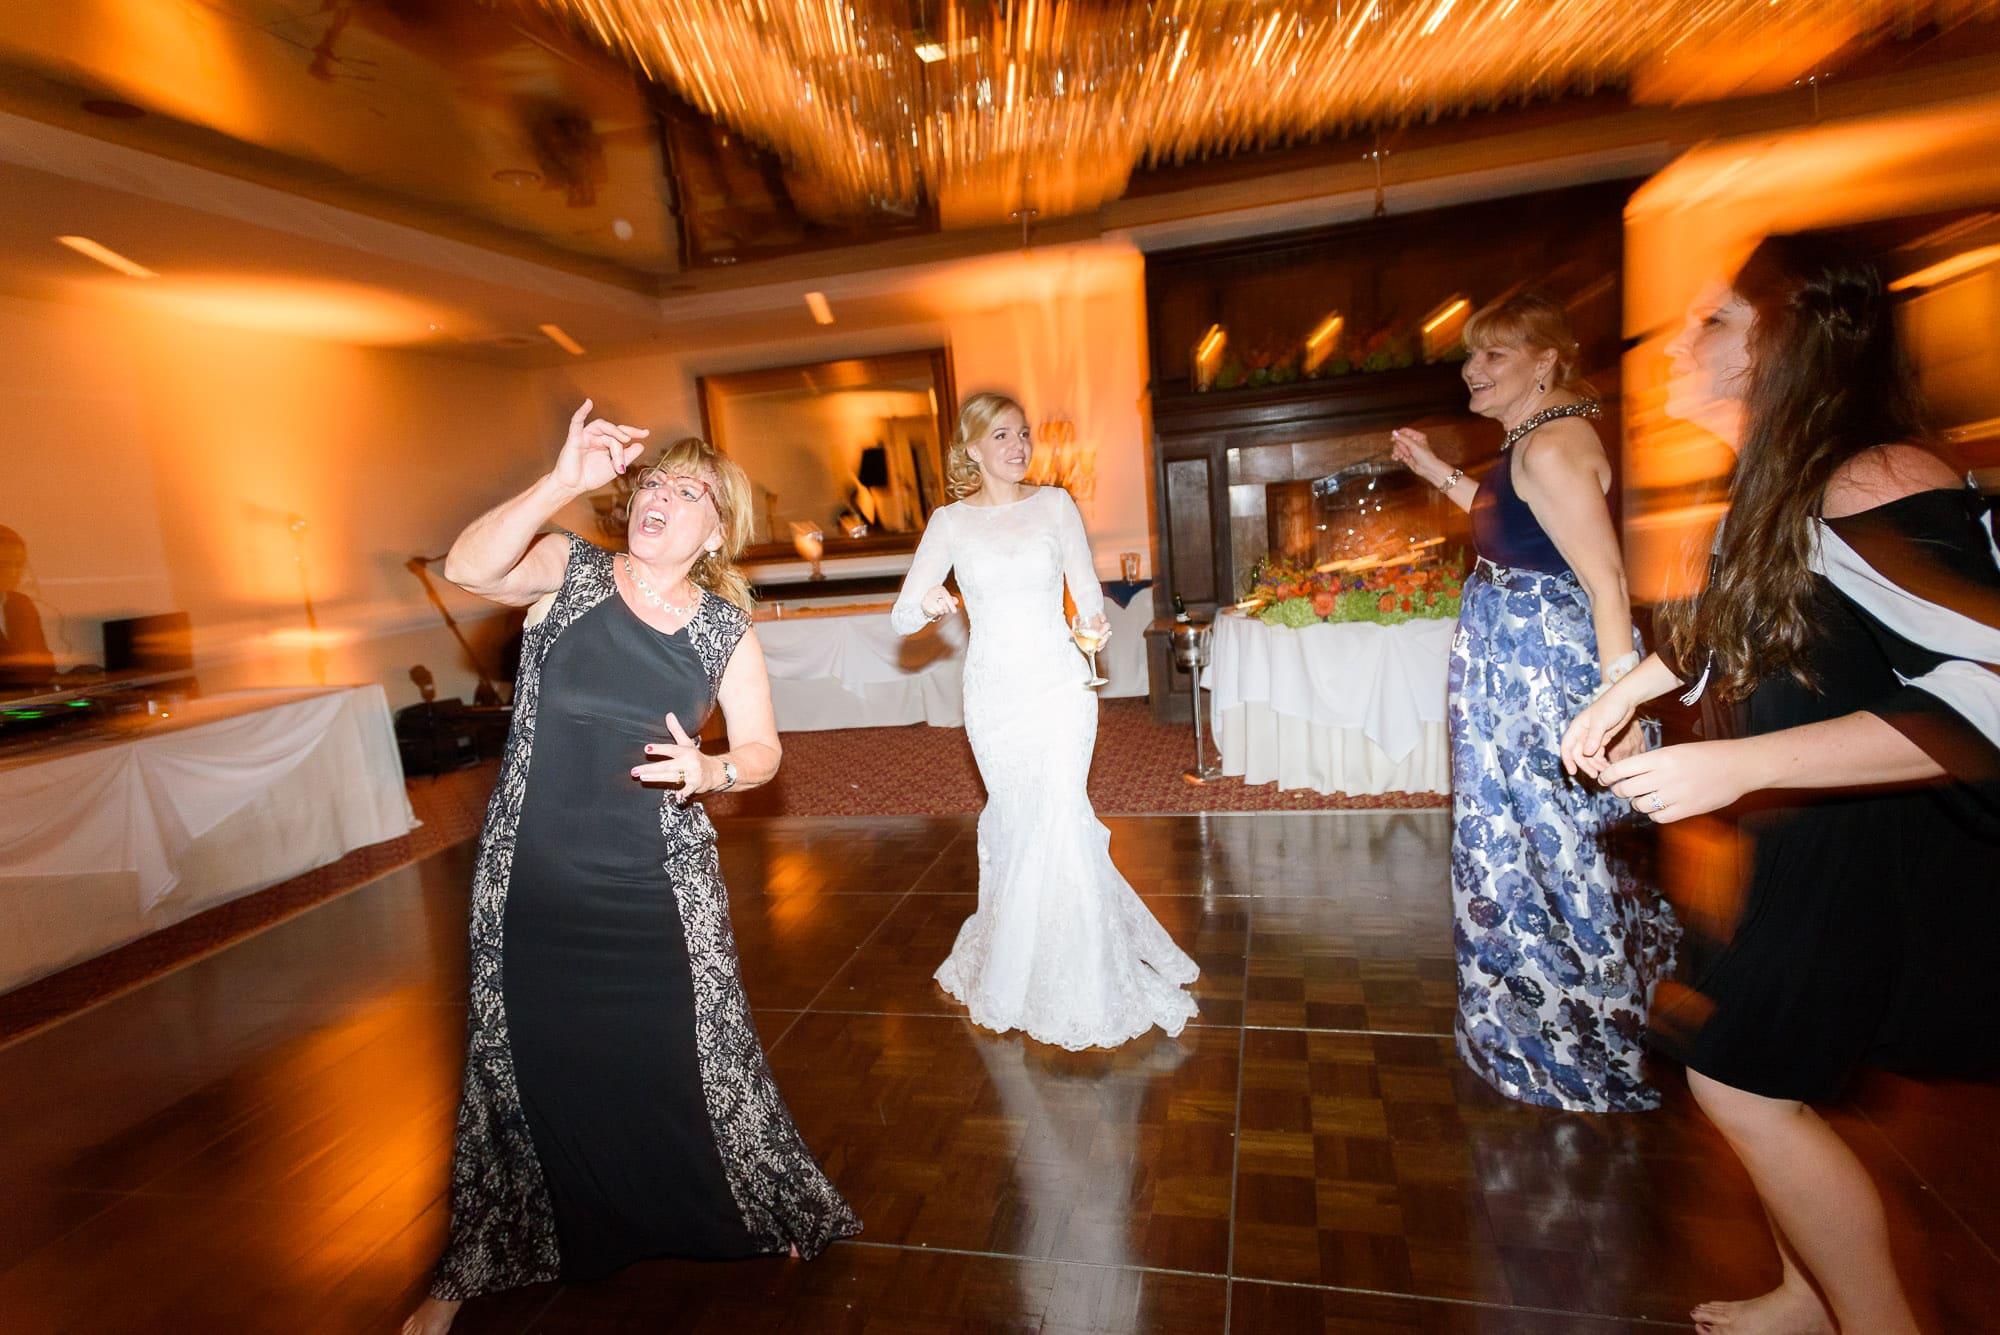 073_Alan_and_Heidi_Los_Angeles_Equestrian_Center_Wedding